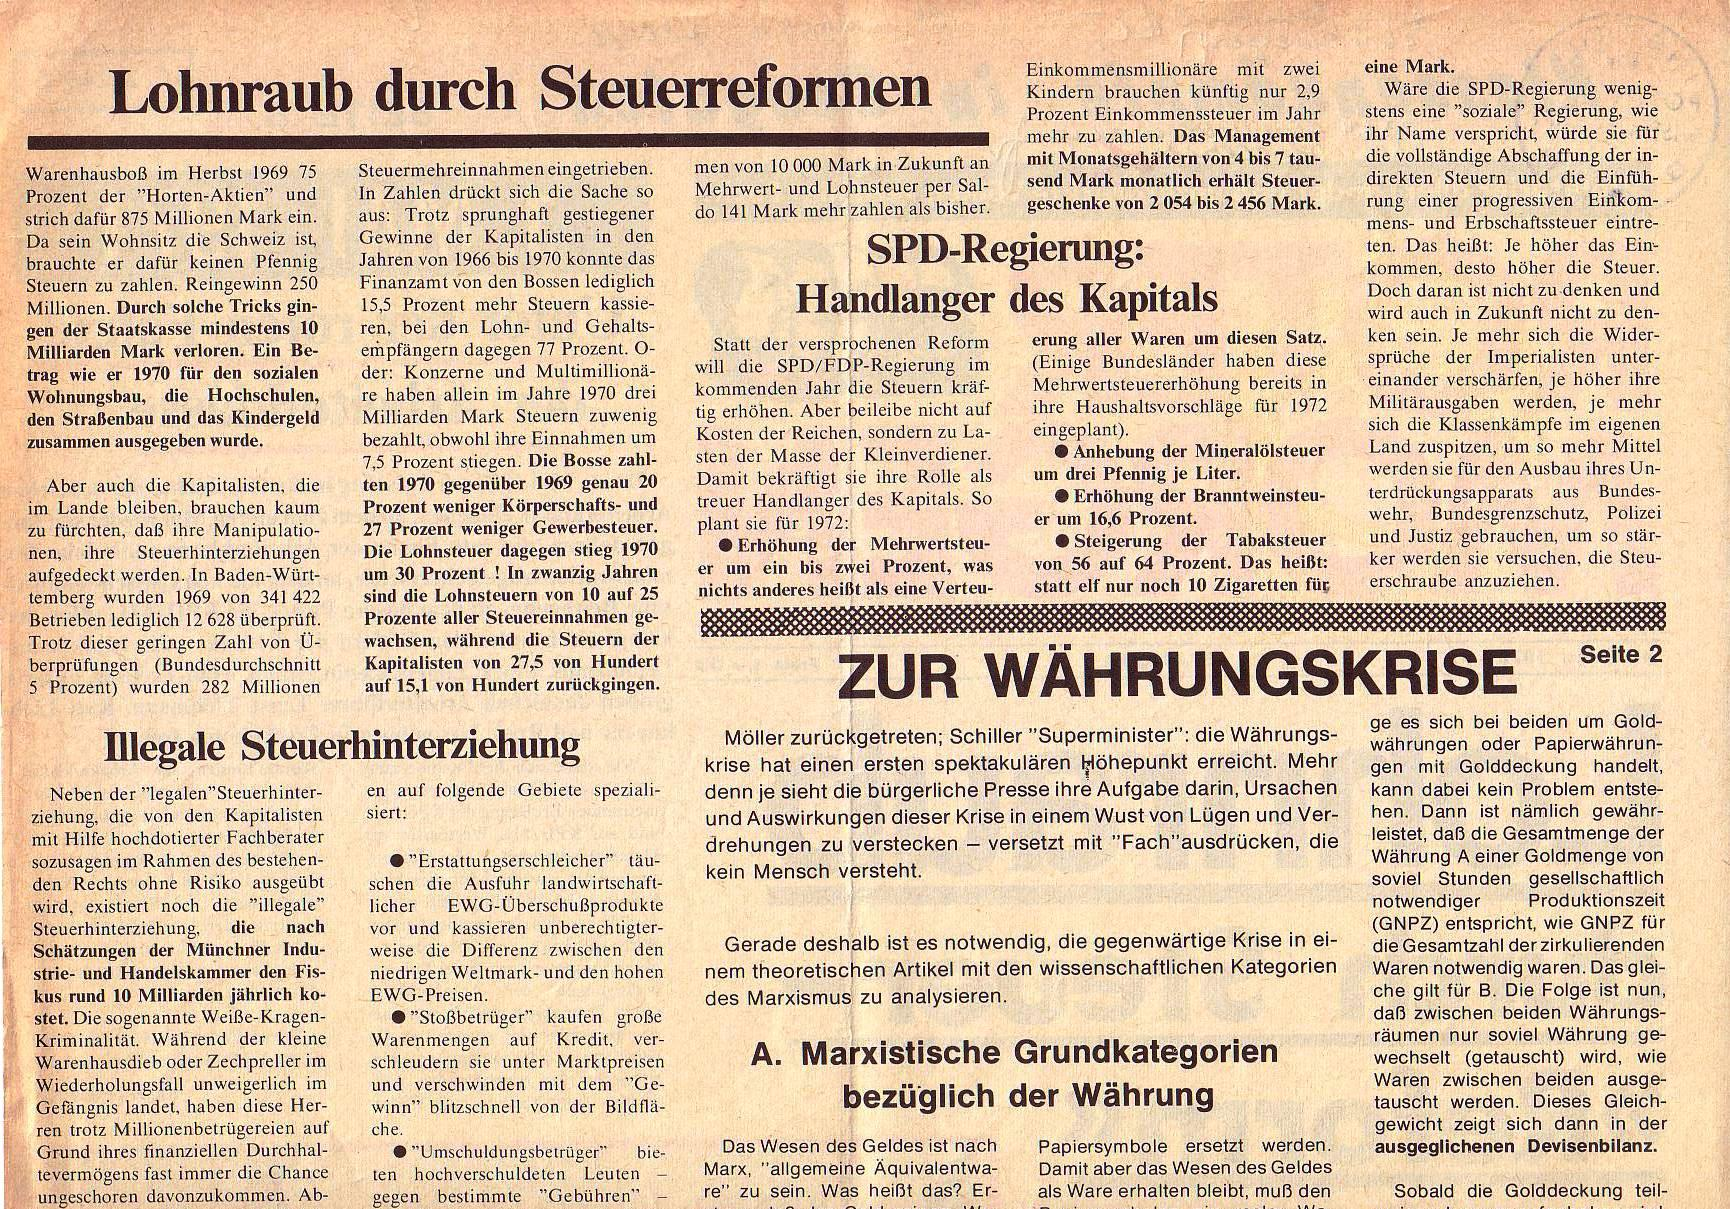 Roter Morgen, 5. Jg., Mai 1971, Nr. 5, Seite 2a